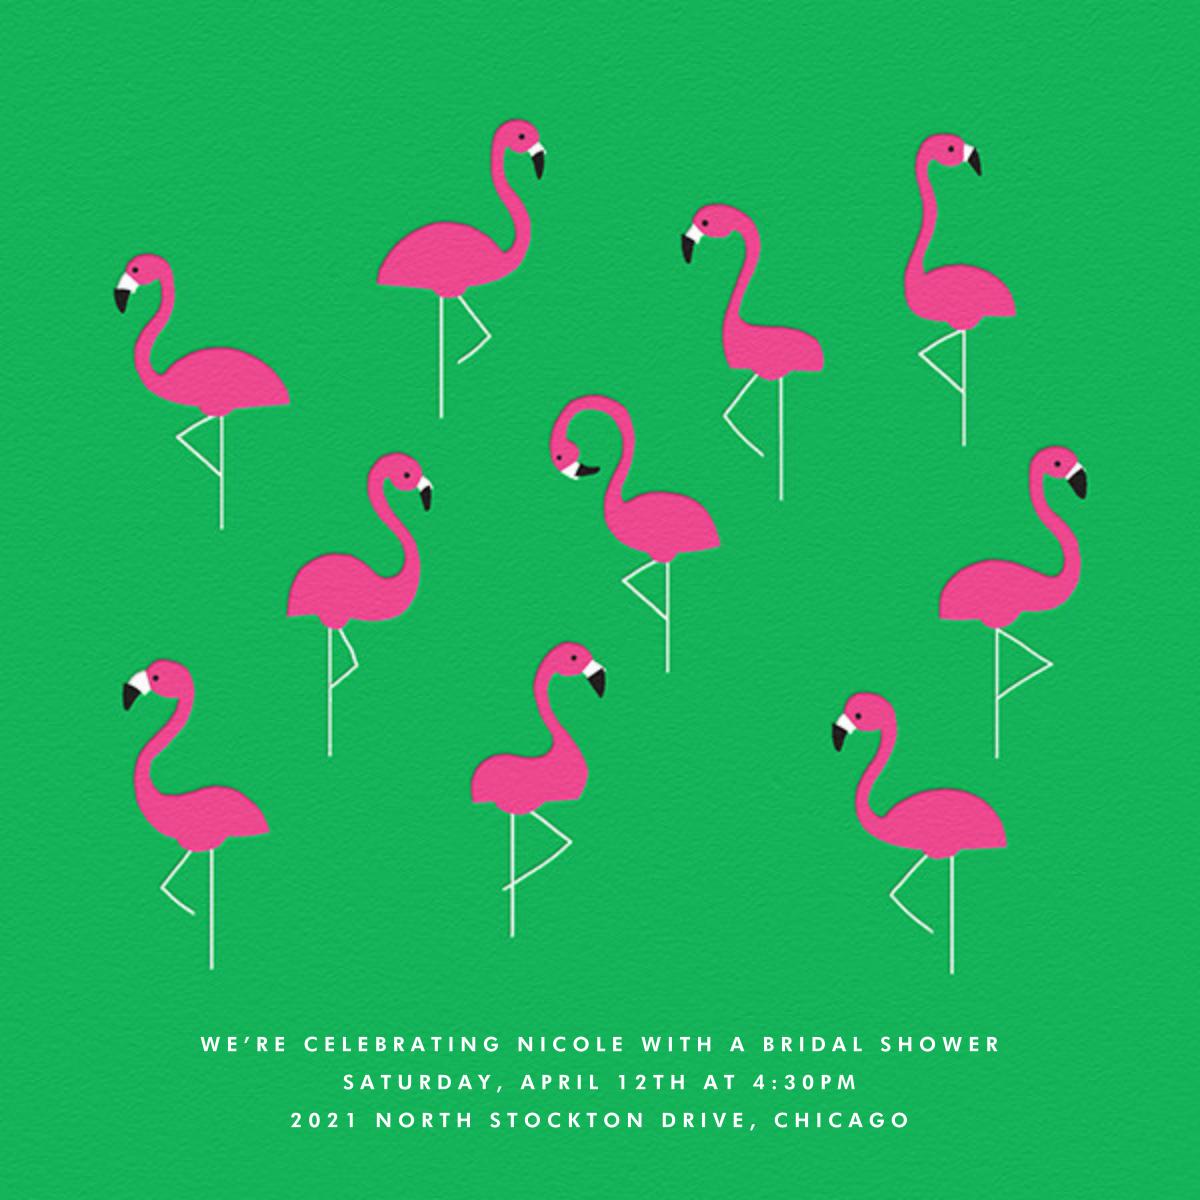 Flamingos - The Indigo Bunting - Bridal shower